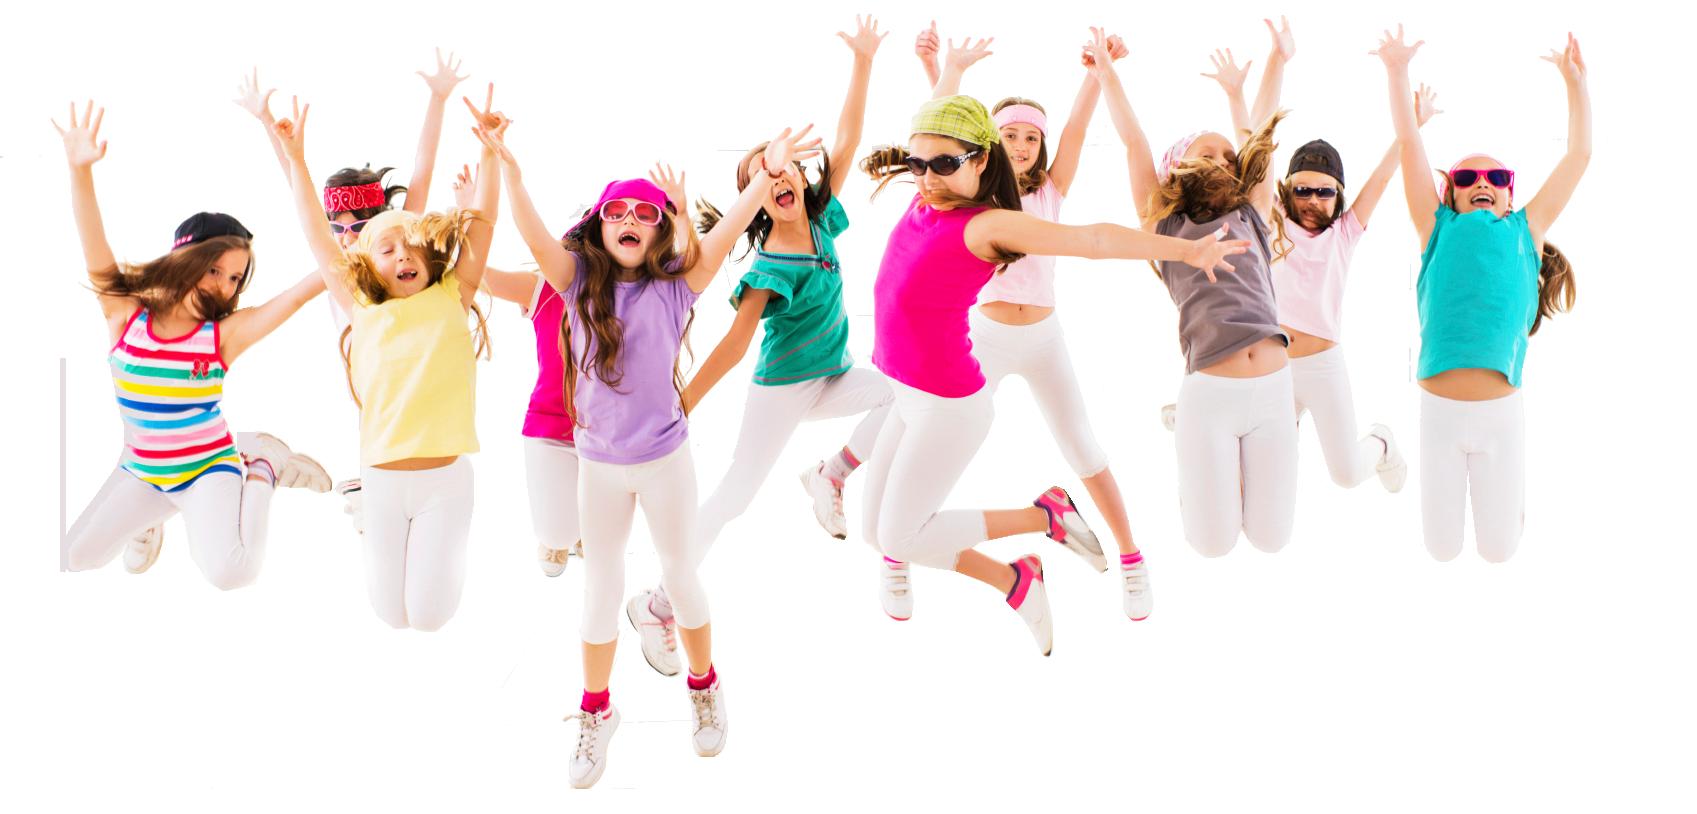 dancing-kids-png-5-png-image-dancing-kids-png-1697_814.png